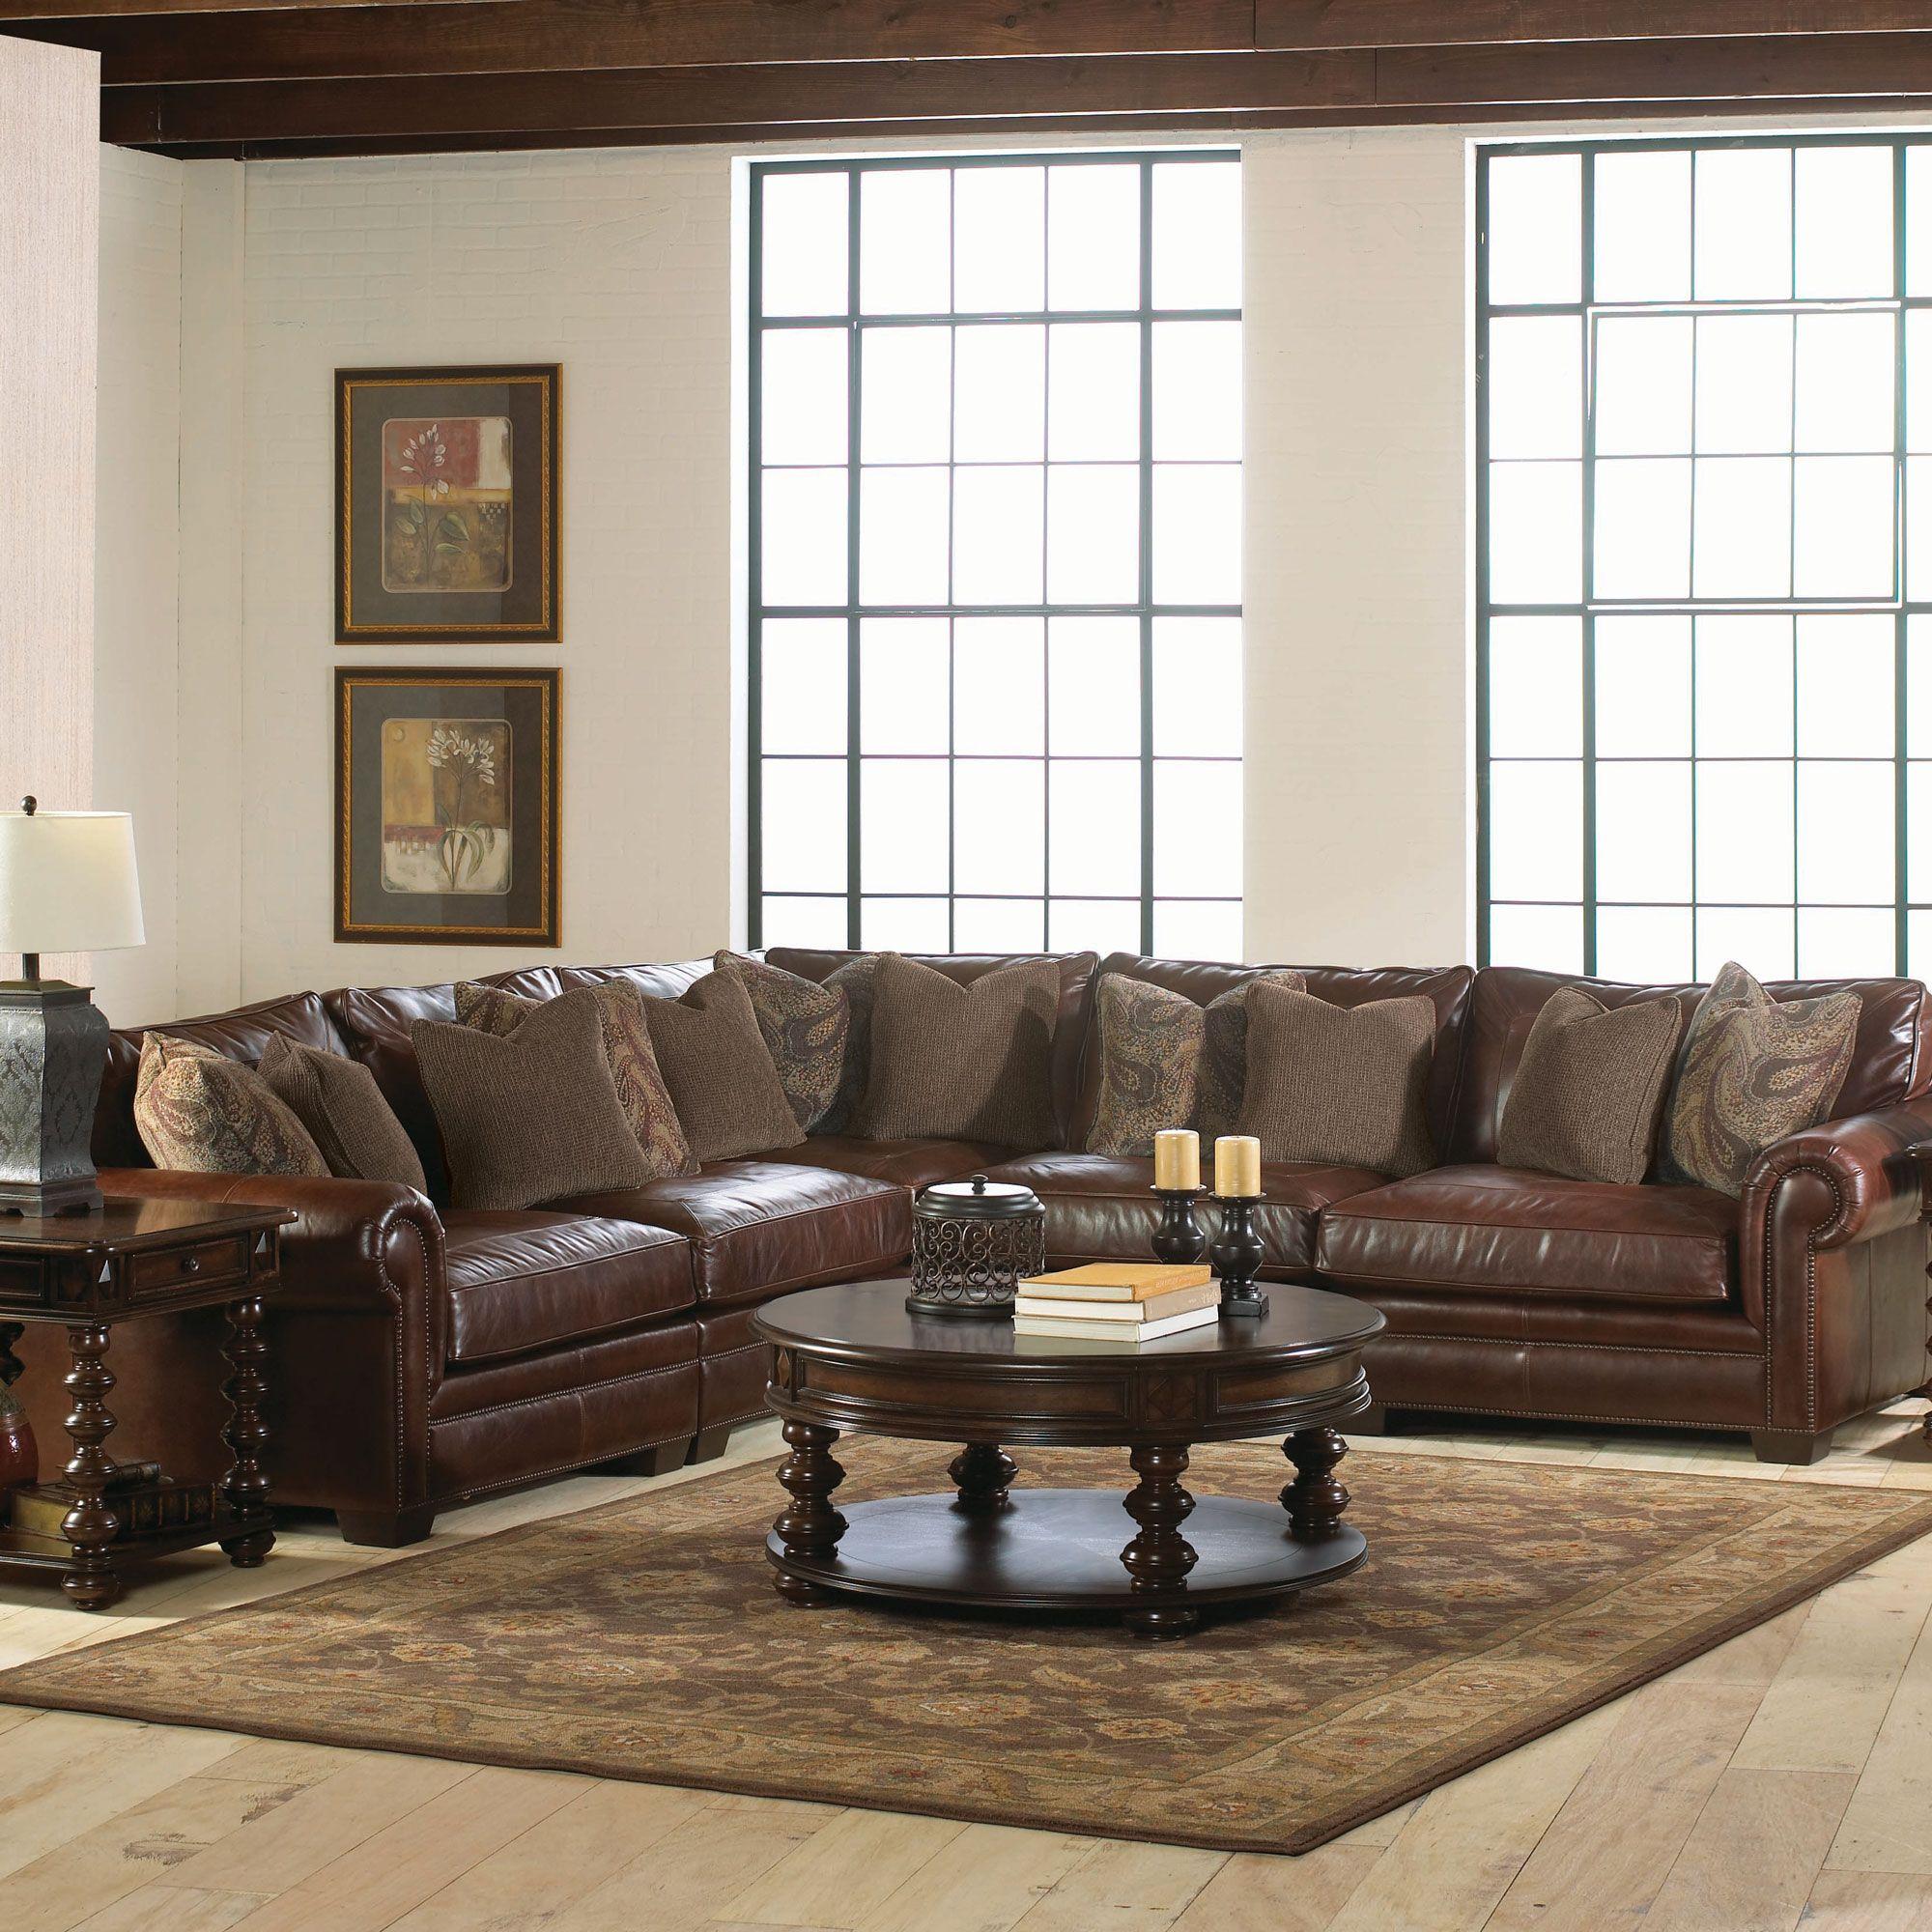 living room sectional grandview by bernhardt at kensington rh pinterest com